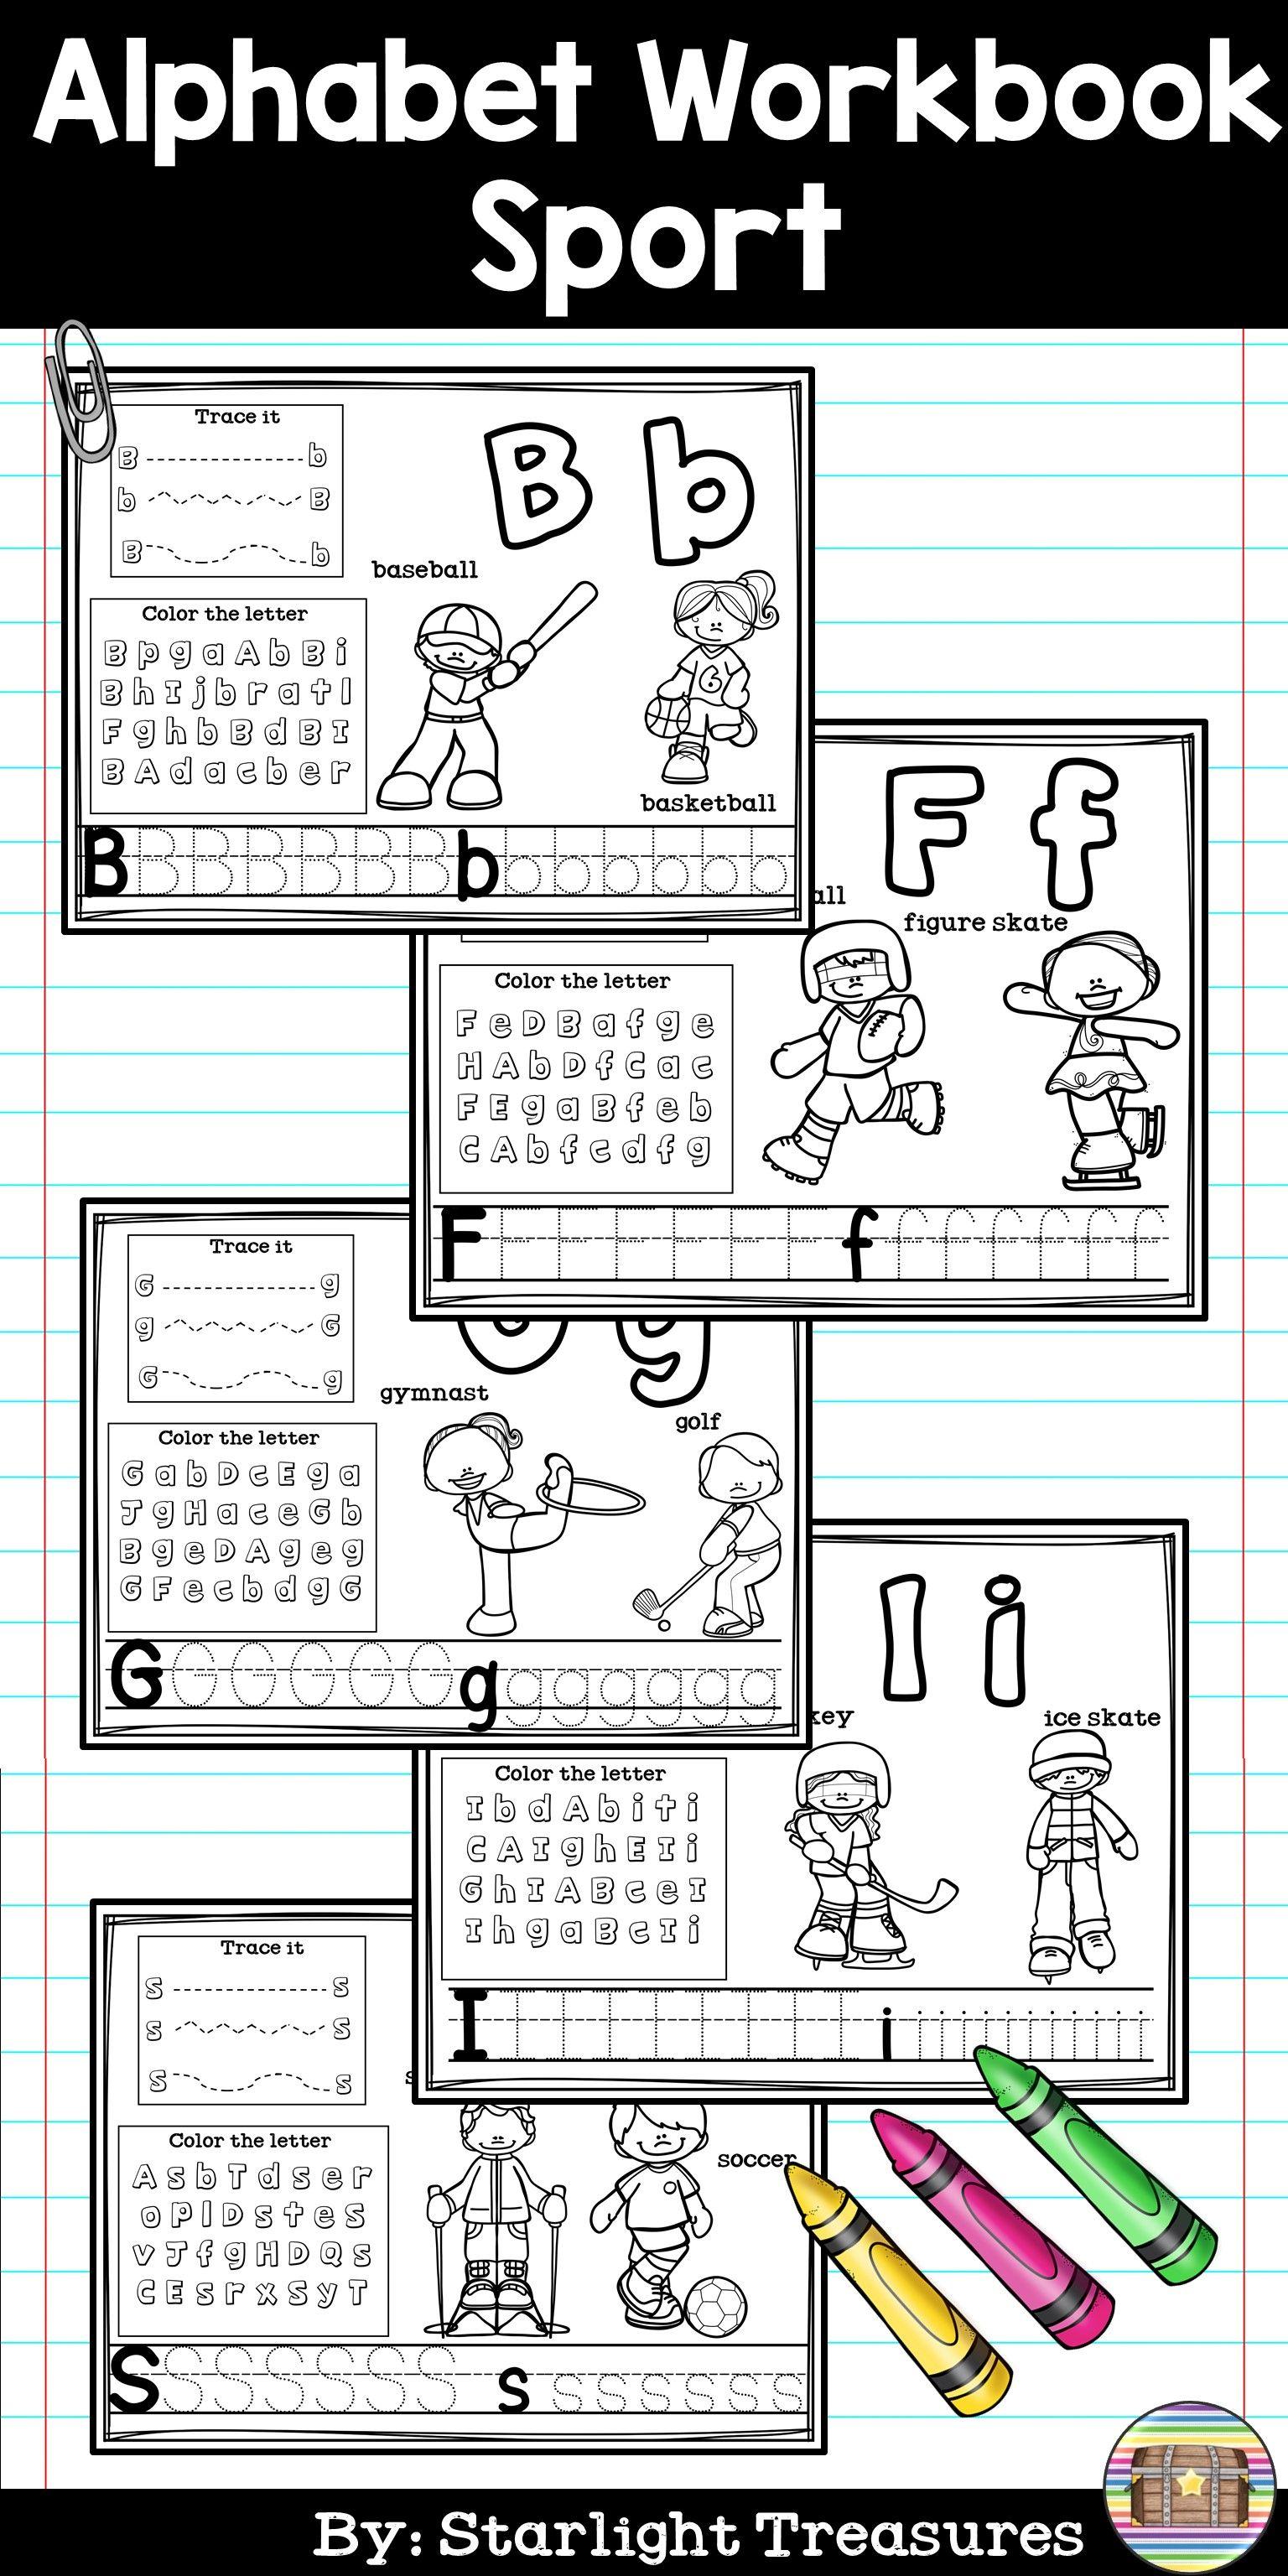 Alphabet Workbook Worksheets A Z Sports Theme